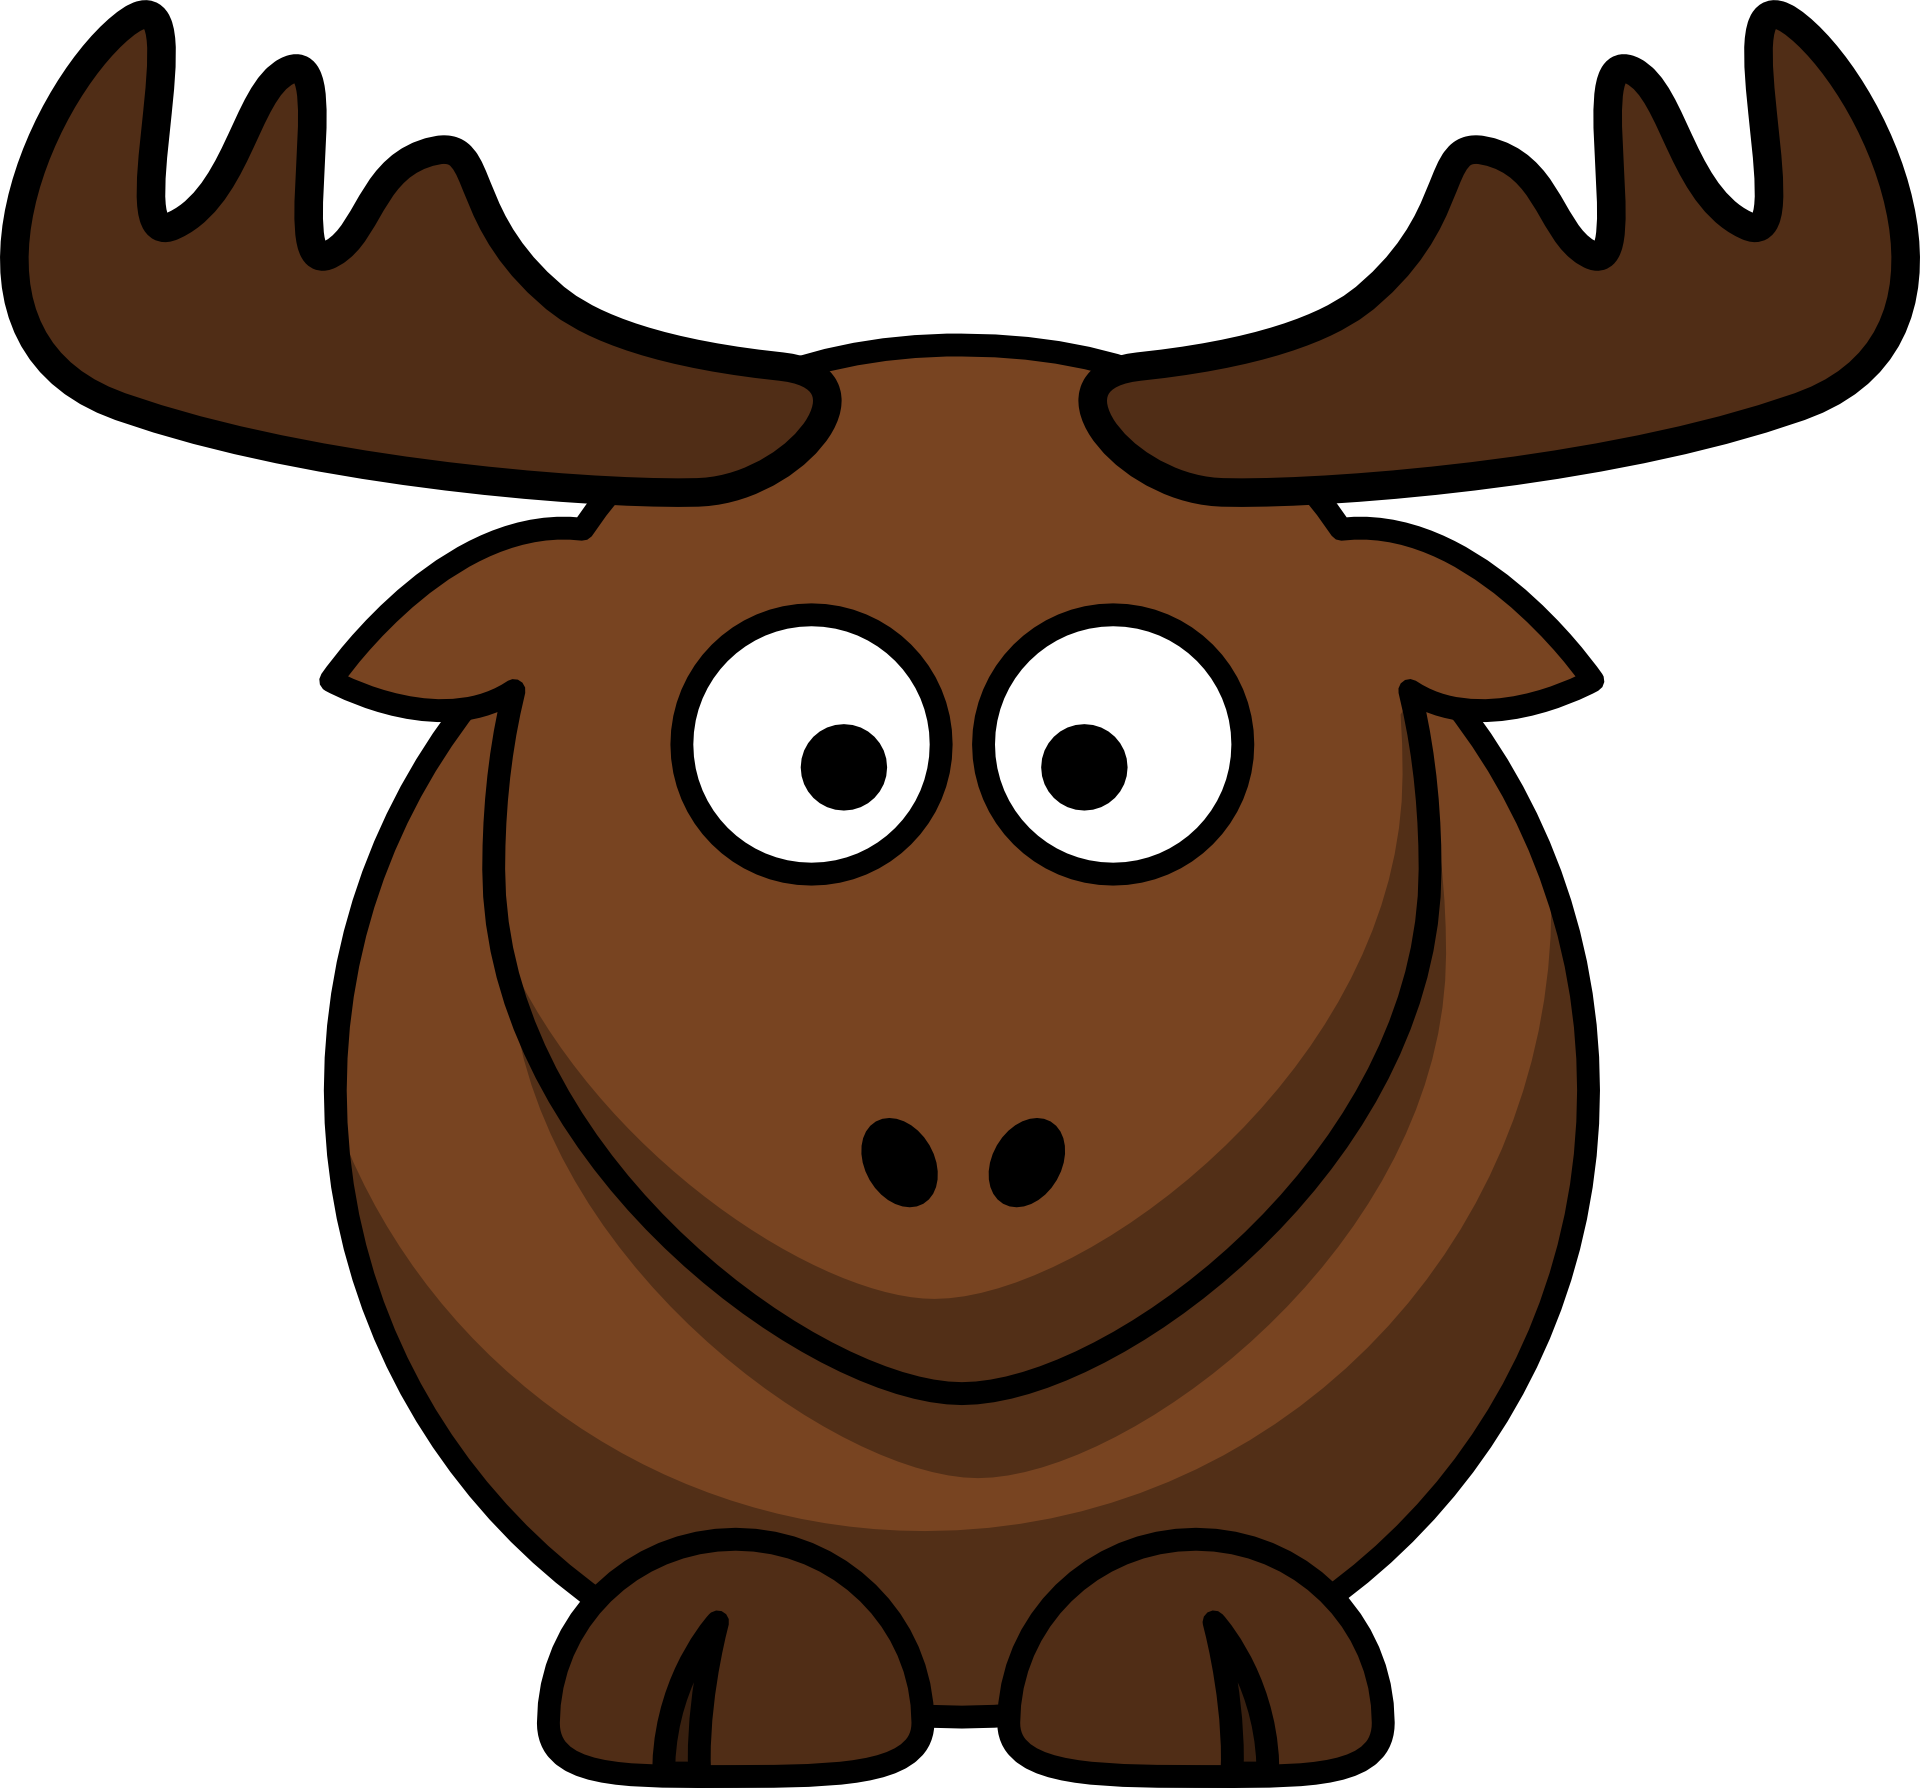 "Illustration: Image by <a href=""https://pixabay.com/users/Clker-Free-Vector-Images-3736/?utm_source=link-attribution&utm_medium=referral&utm_campaign=image&utm_content=35579"">Clker-Free-Vector-Images</a> from <a href=""https://pixabay.com/?utm_source=link-attribution&utm_medium=referral&utm_campaign=image&utm_content=35579"">Pixabay</a>"